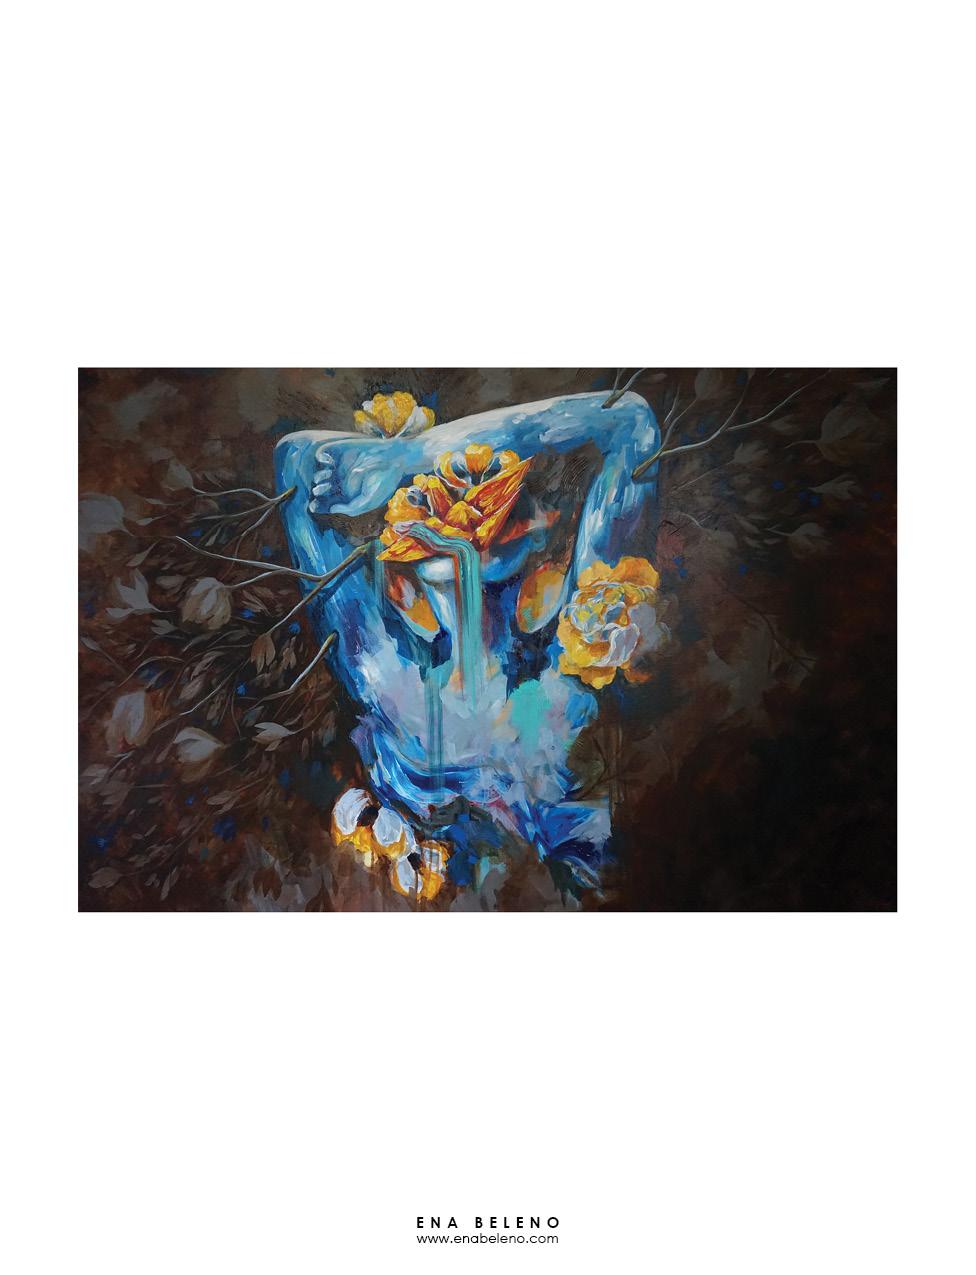 Ena Beleno painting